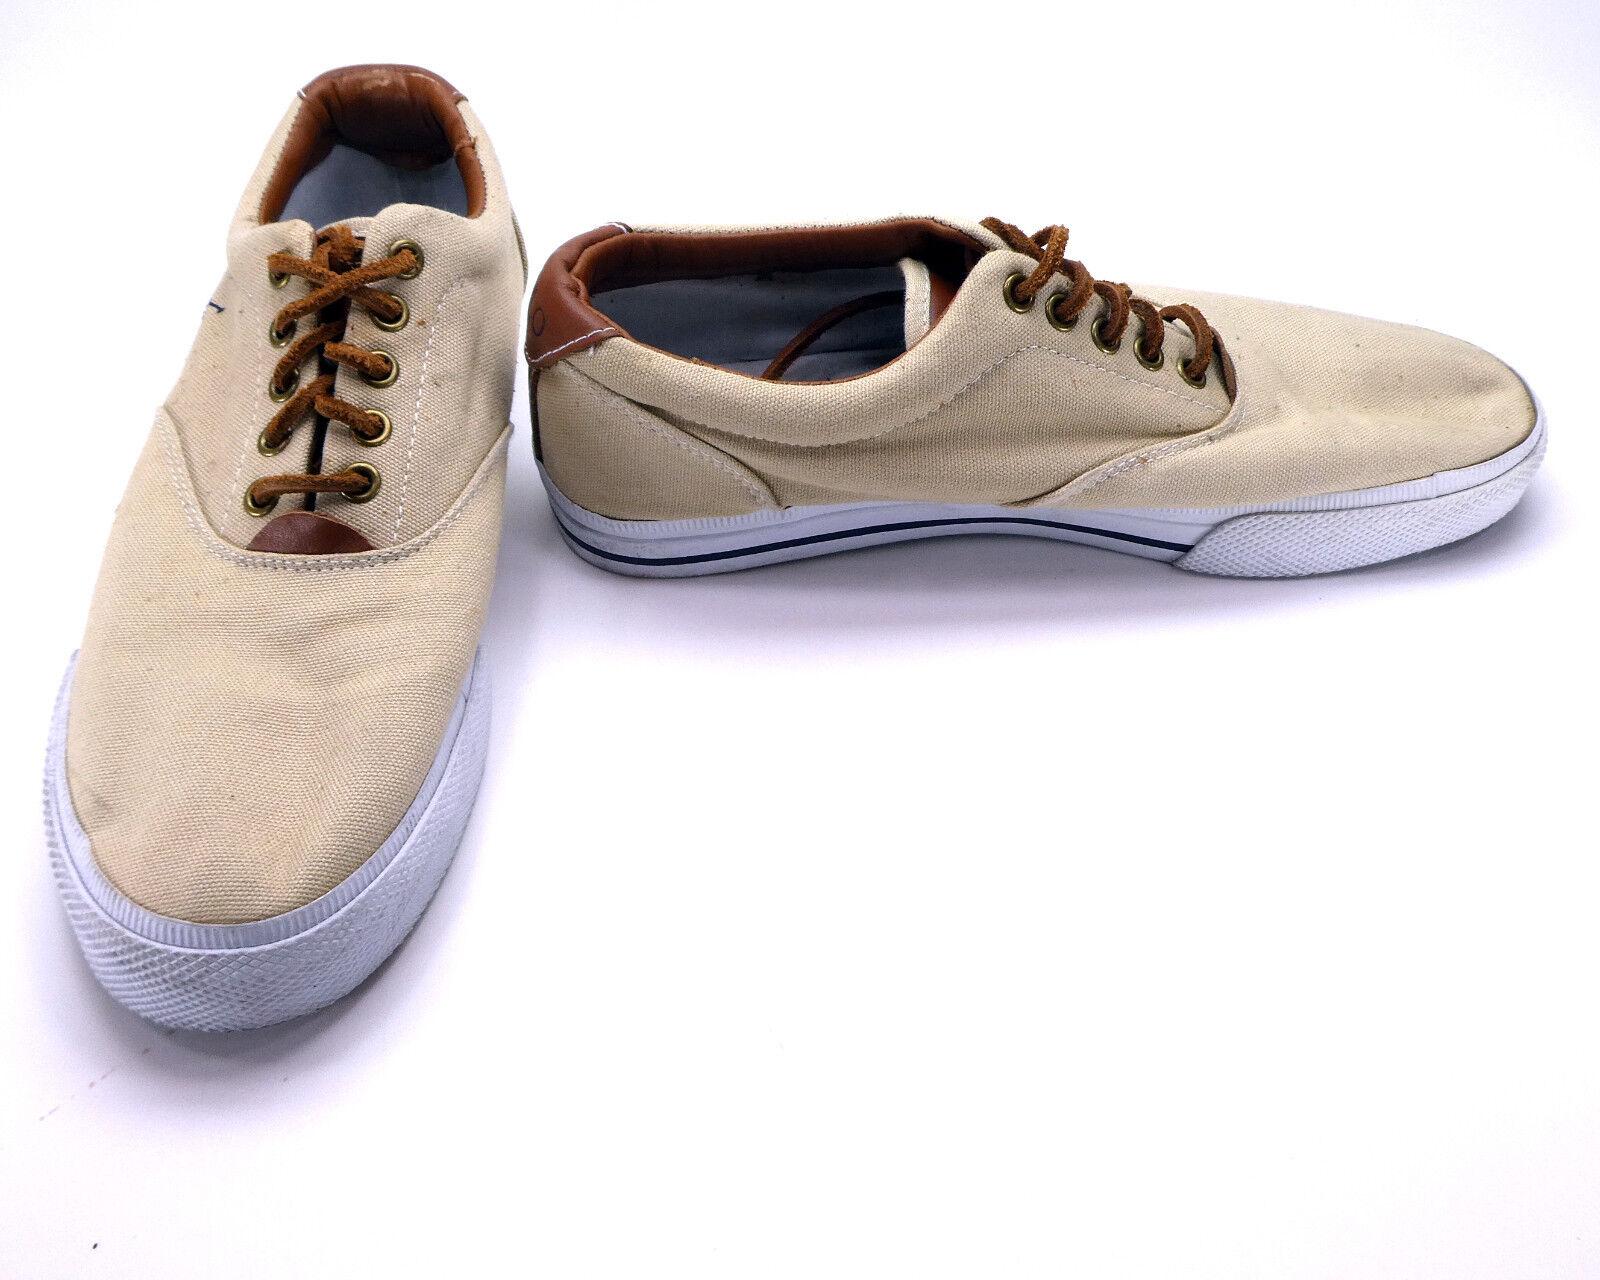 Polo Ralph Lauren shoes Vaughn Athletic Canvas Khaki Tan Sneakers Size 9.5